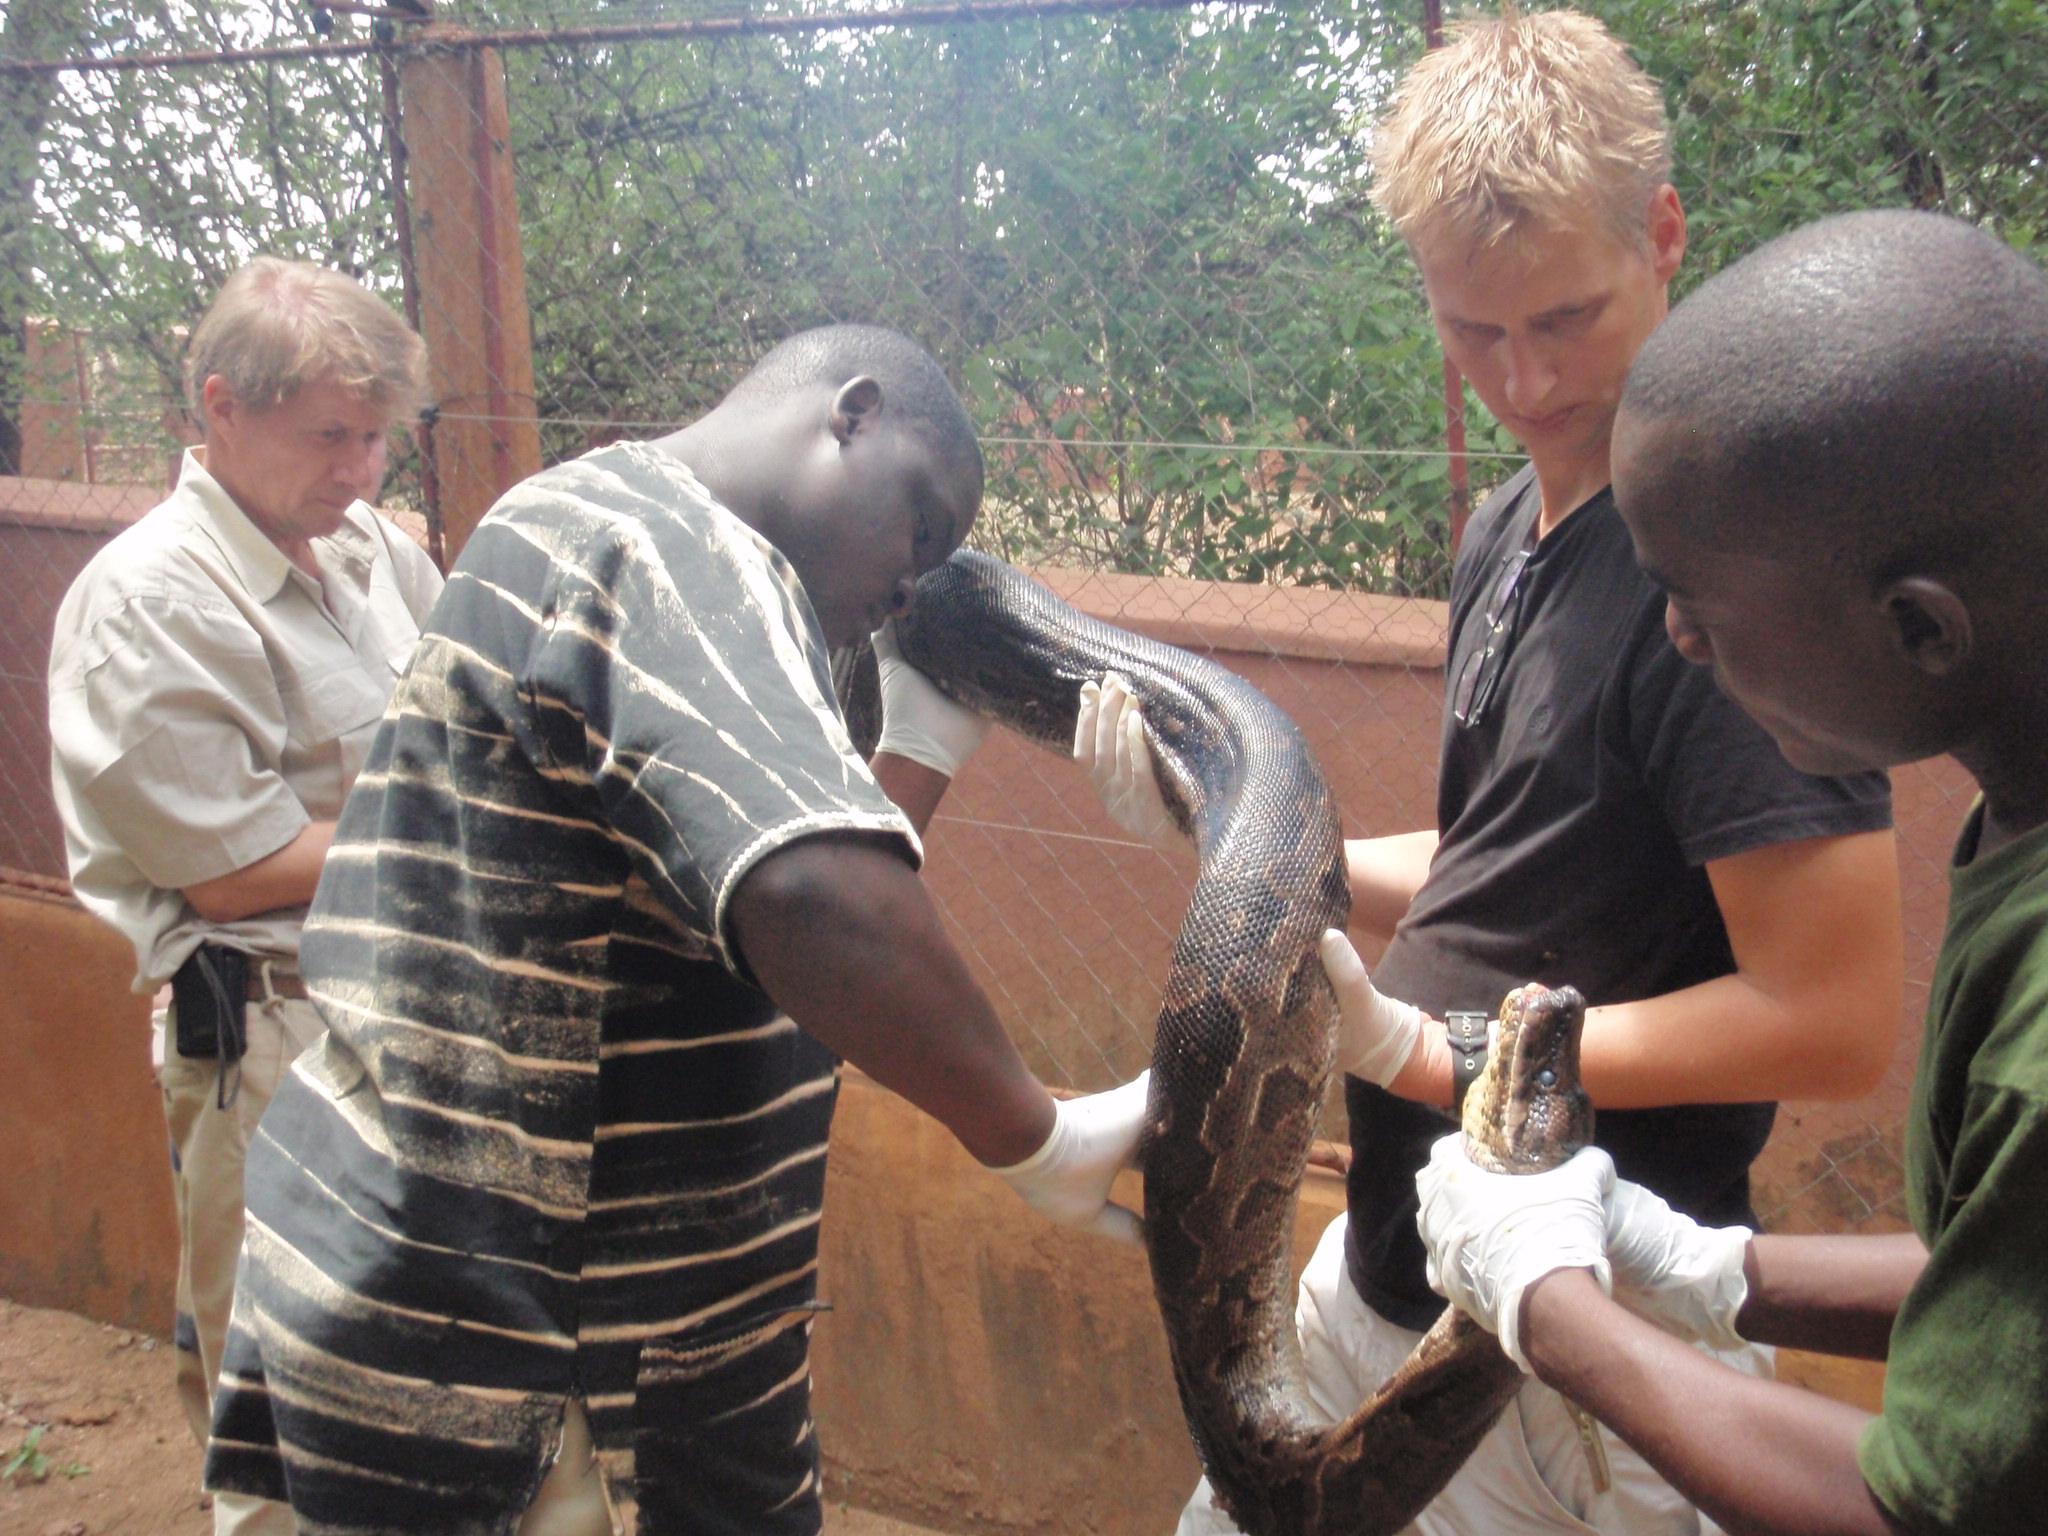 Dr Ssuna helps a sick python